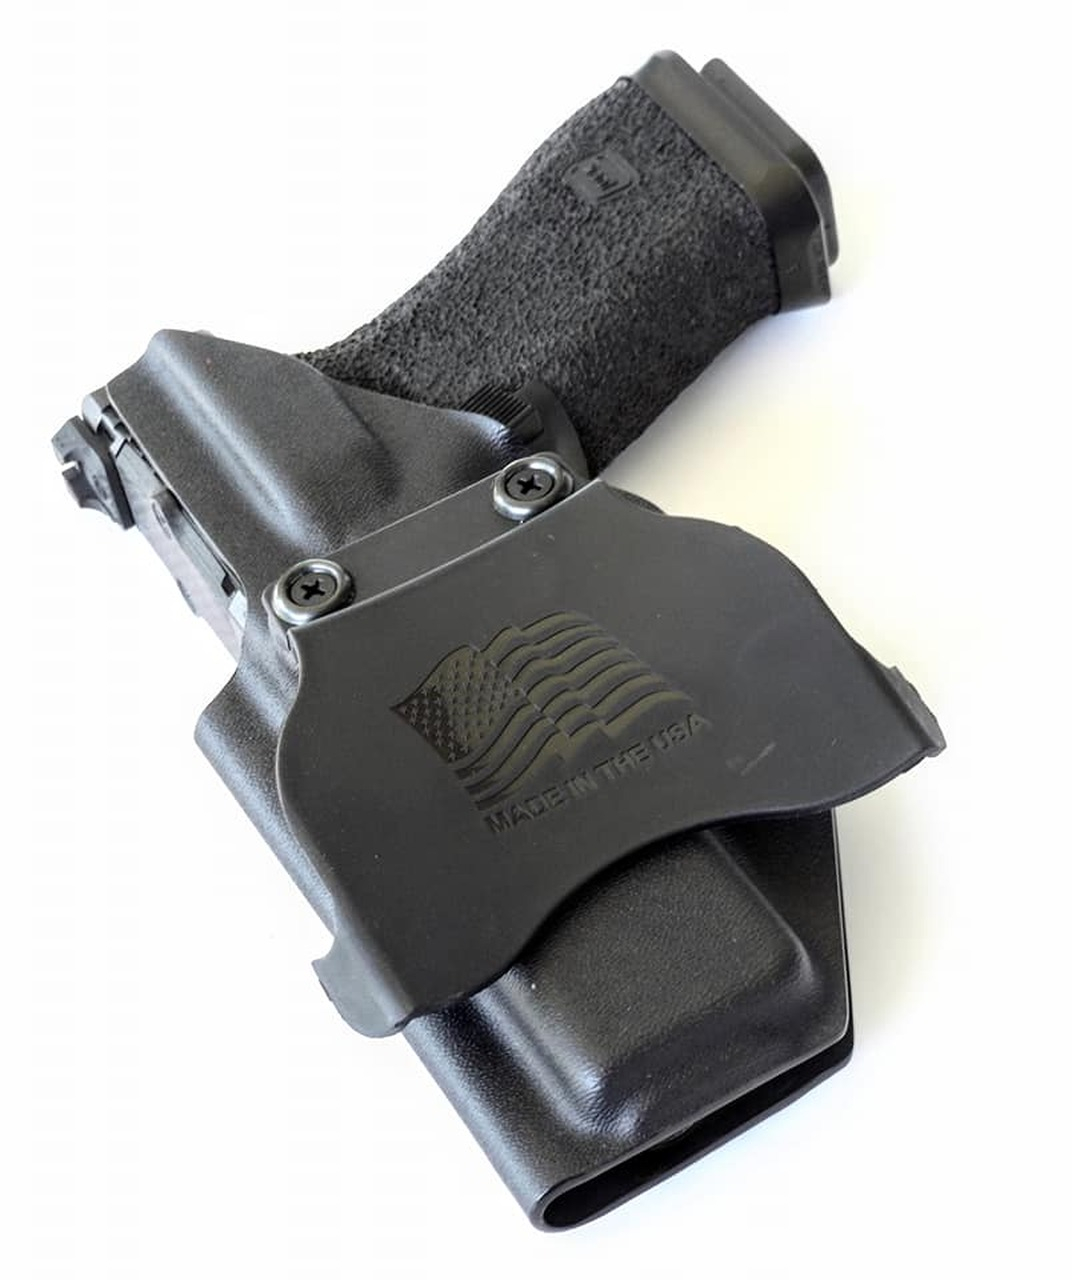 Glock 19 Outside Waistband Kydex Holster